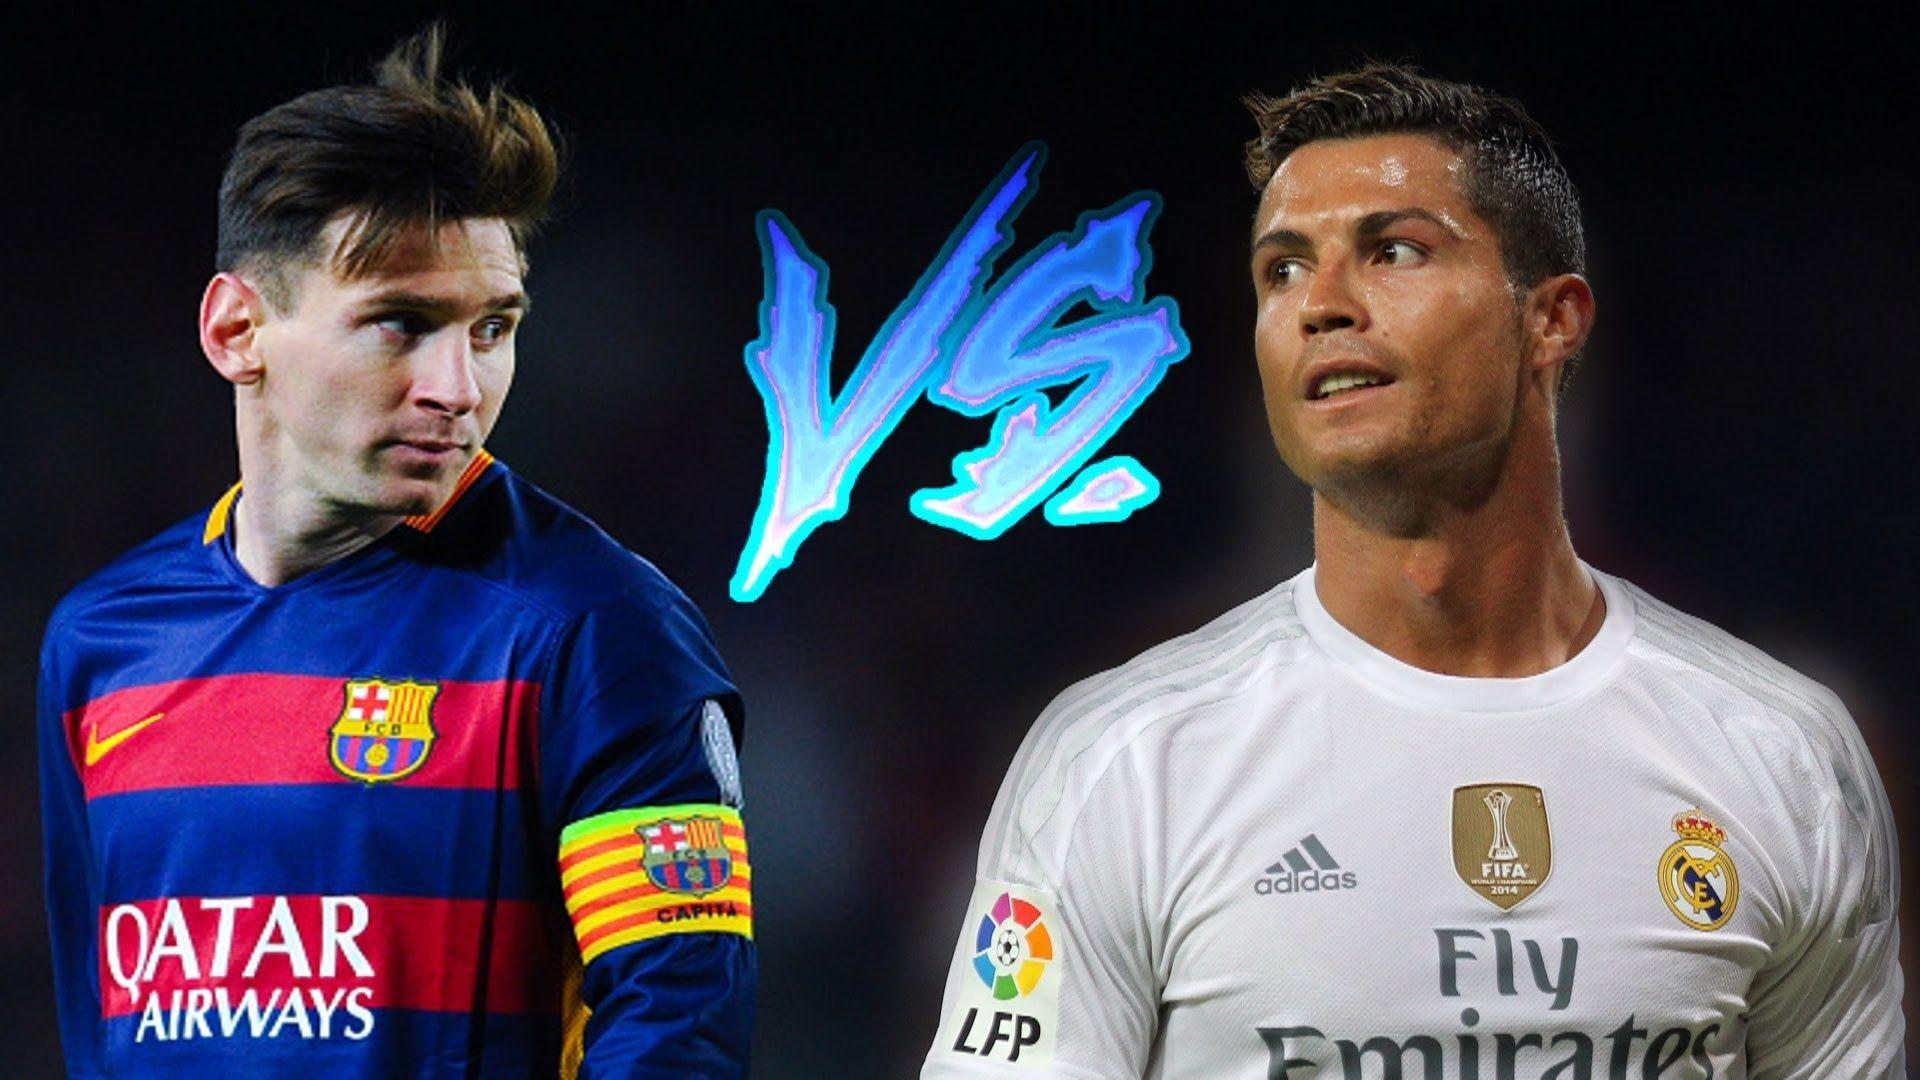 Cristiano Ronaldo Vs Messi 2014 Wallpapers High Quality ...